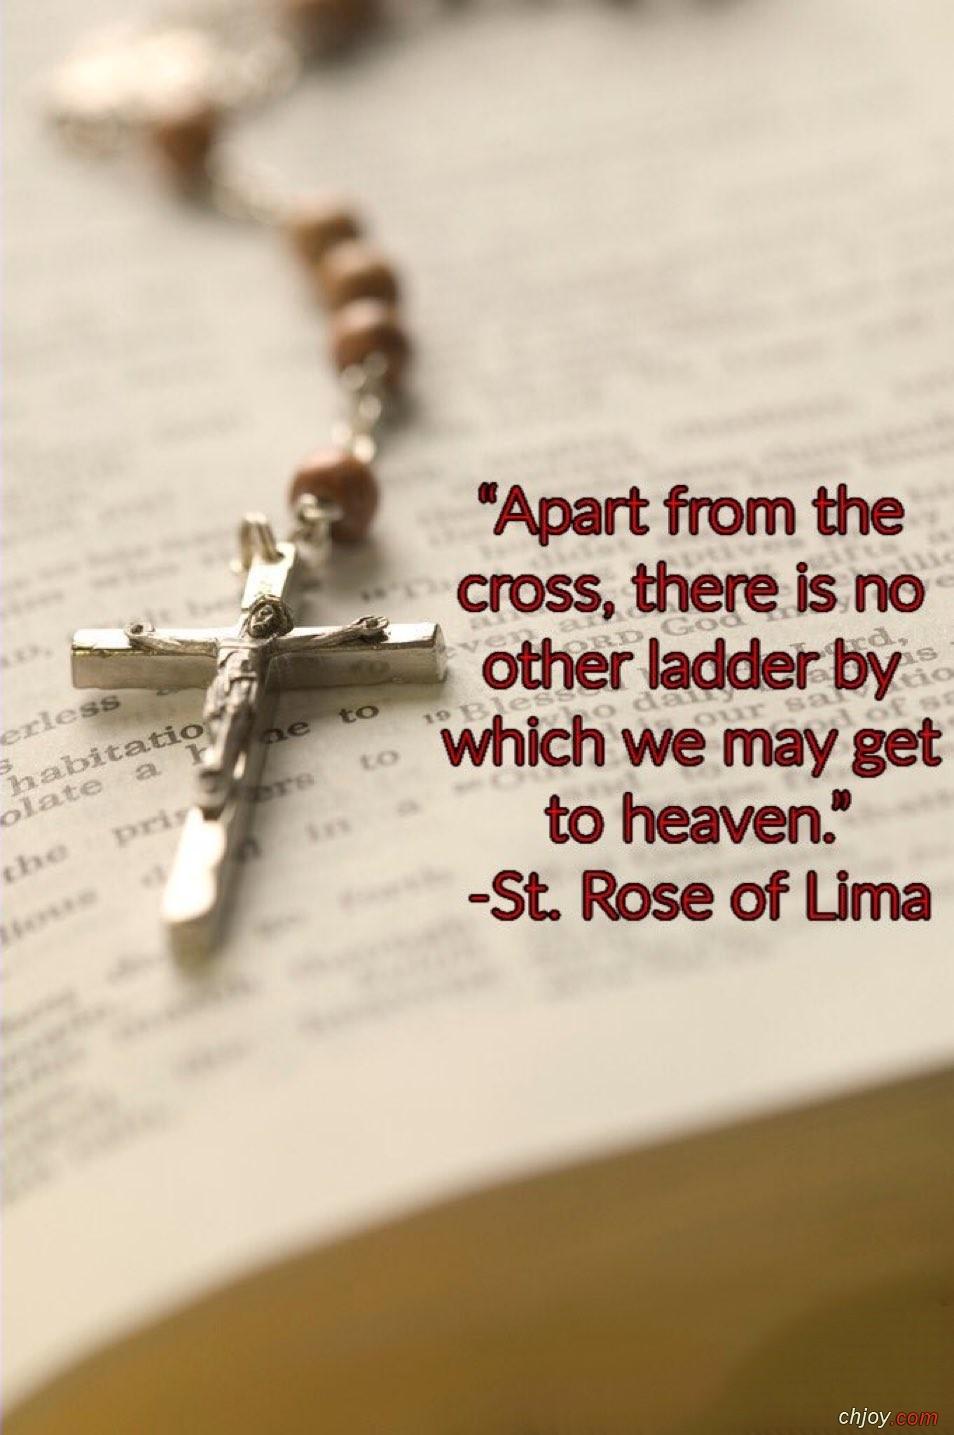 let us Choose Jesus